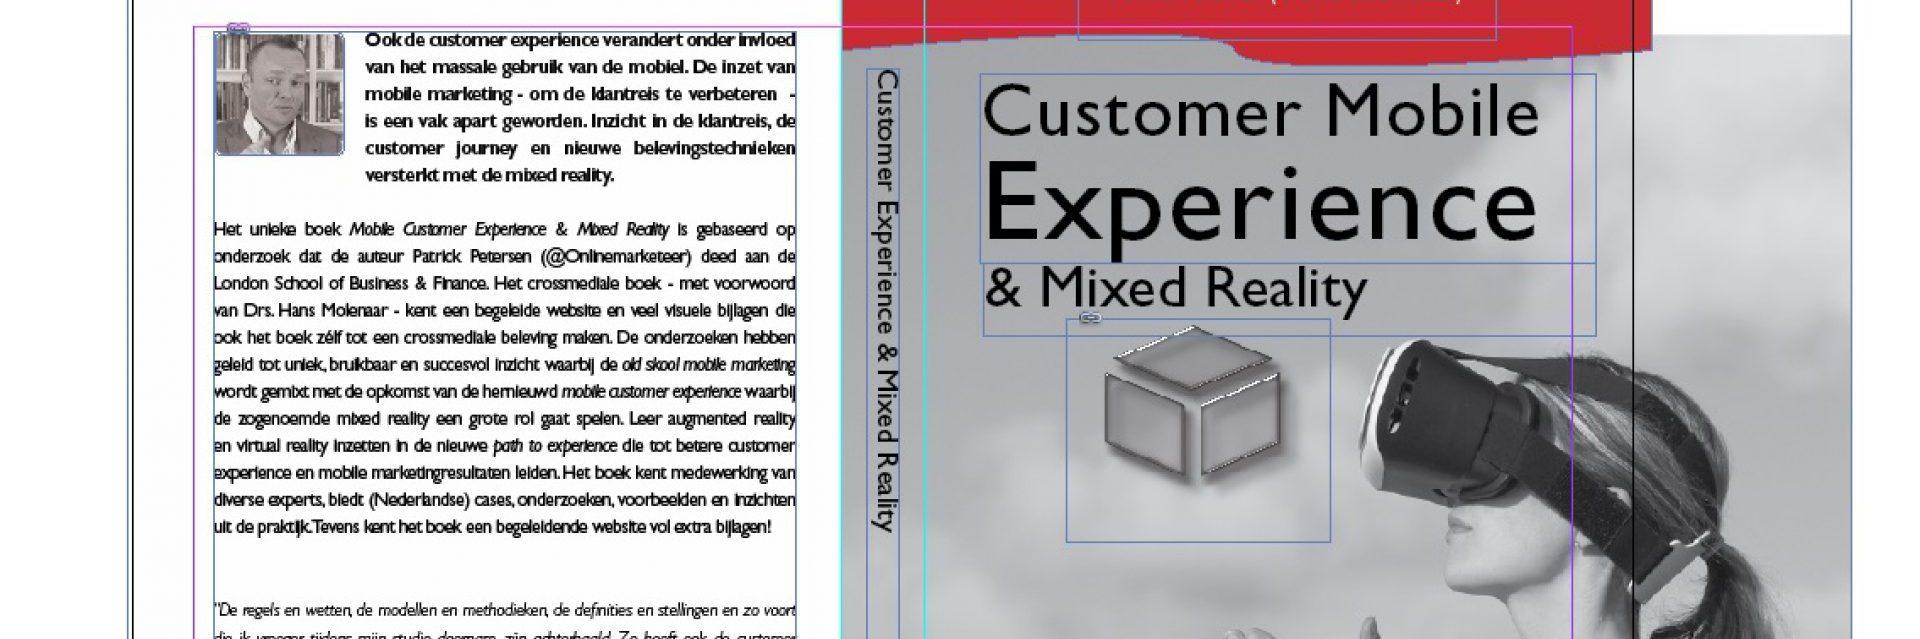 Boek Mobile Customer Experience & Mixed Reality – Patrick Petersen